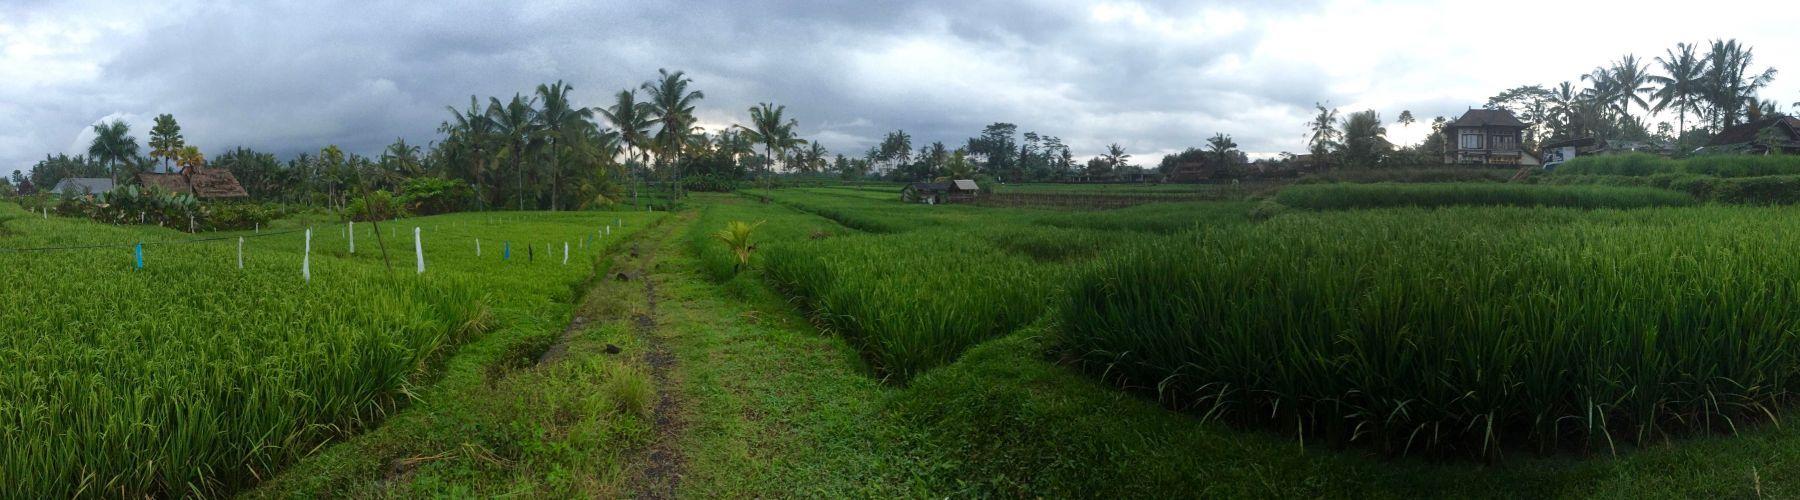 Tegalalang Rice Fields, Ubud, Bali, Indonesia